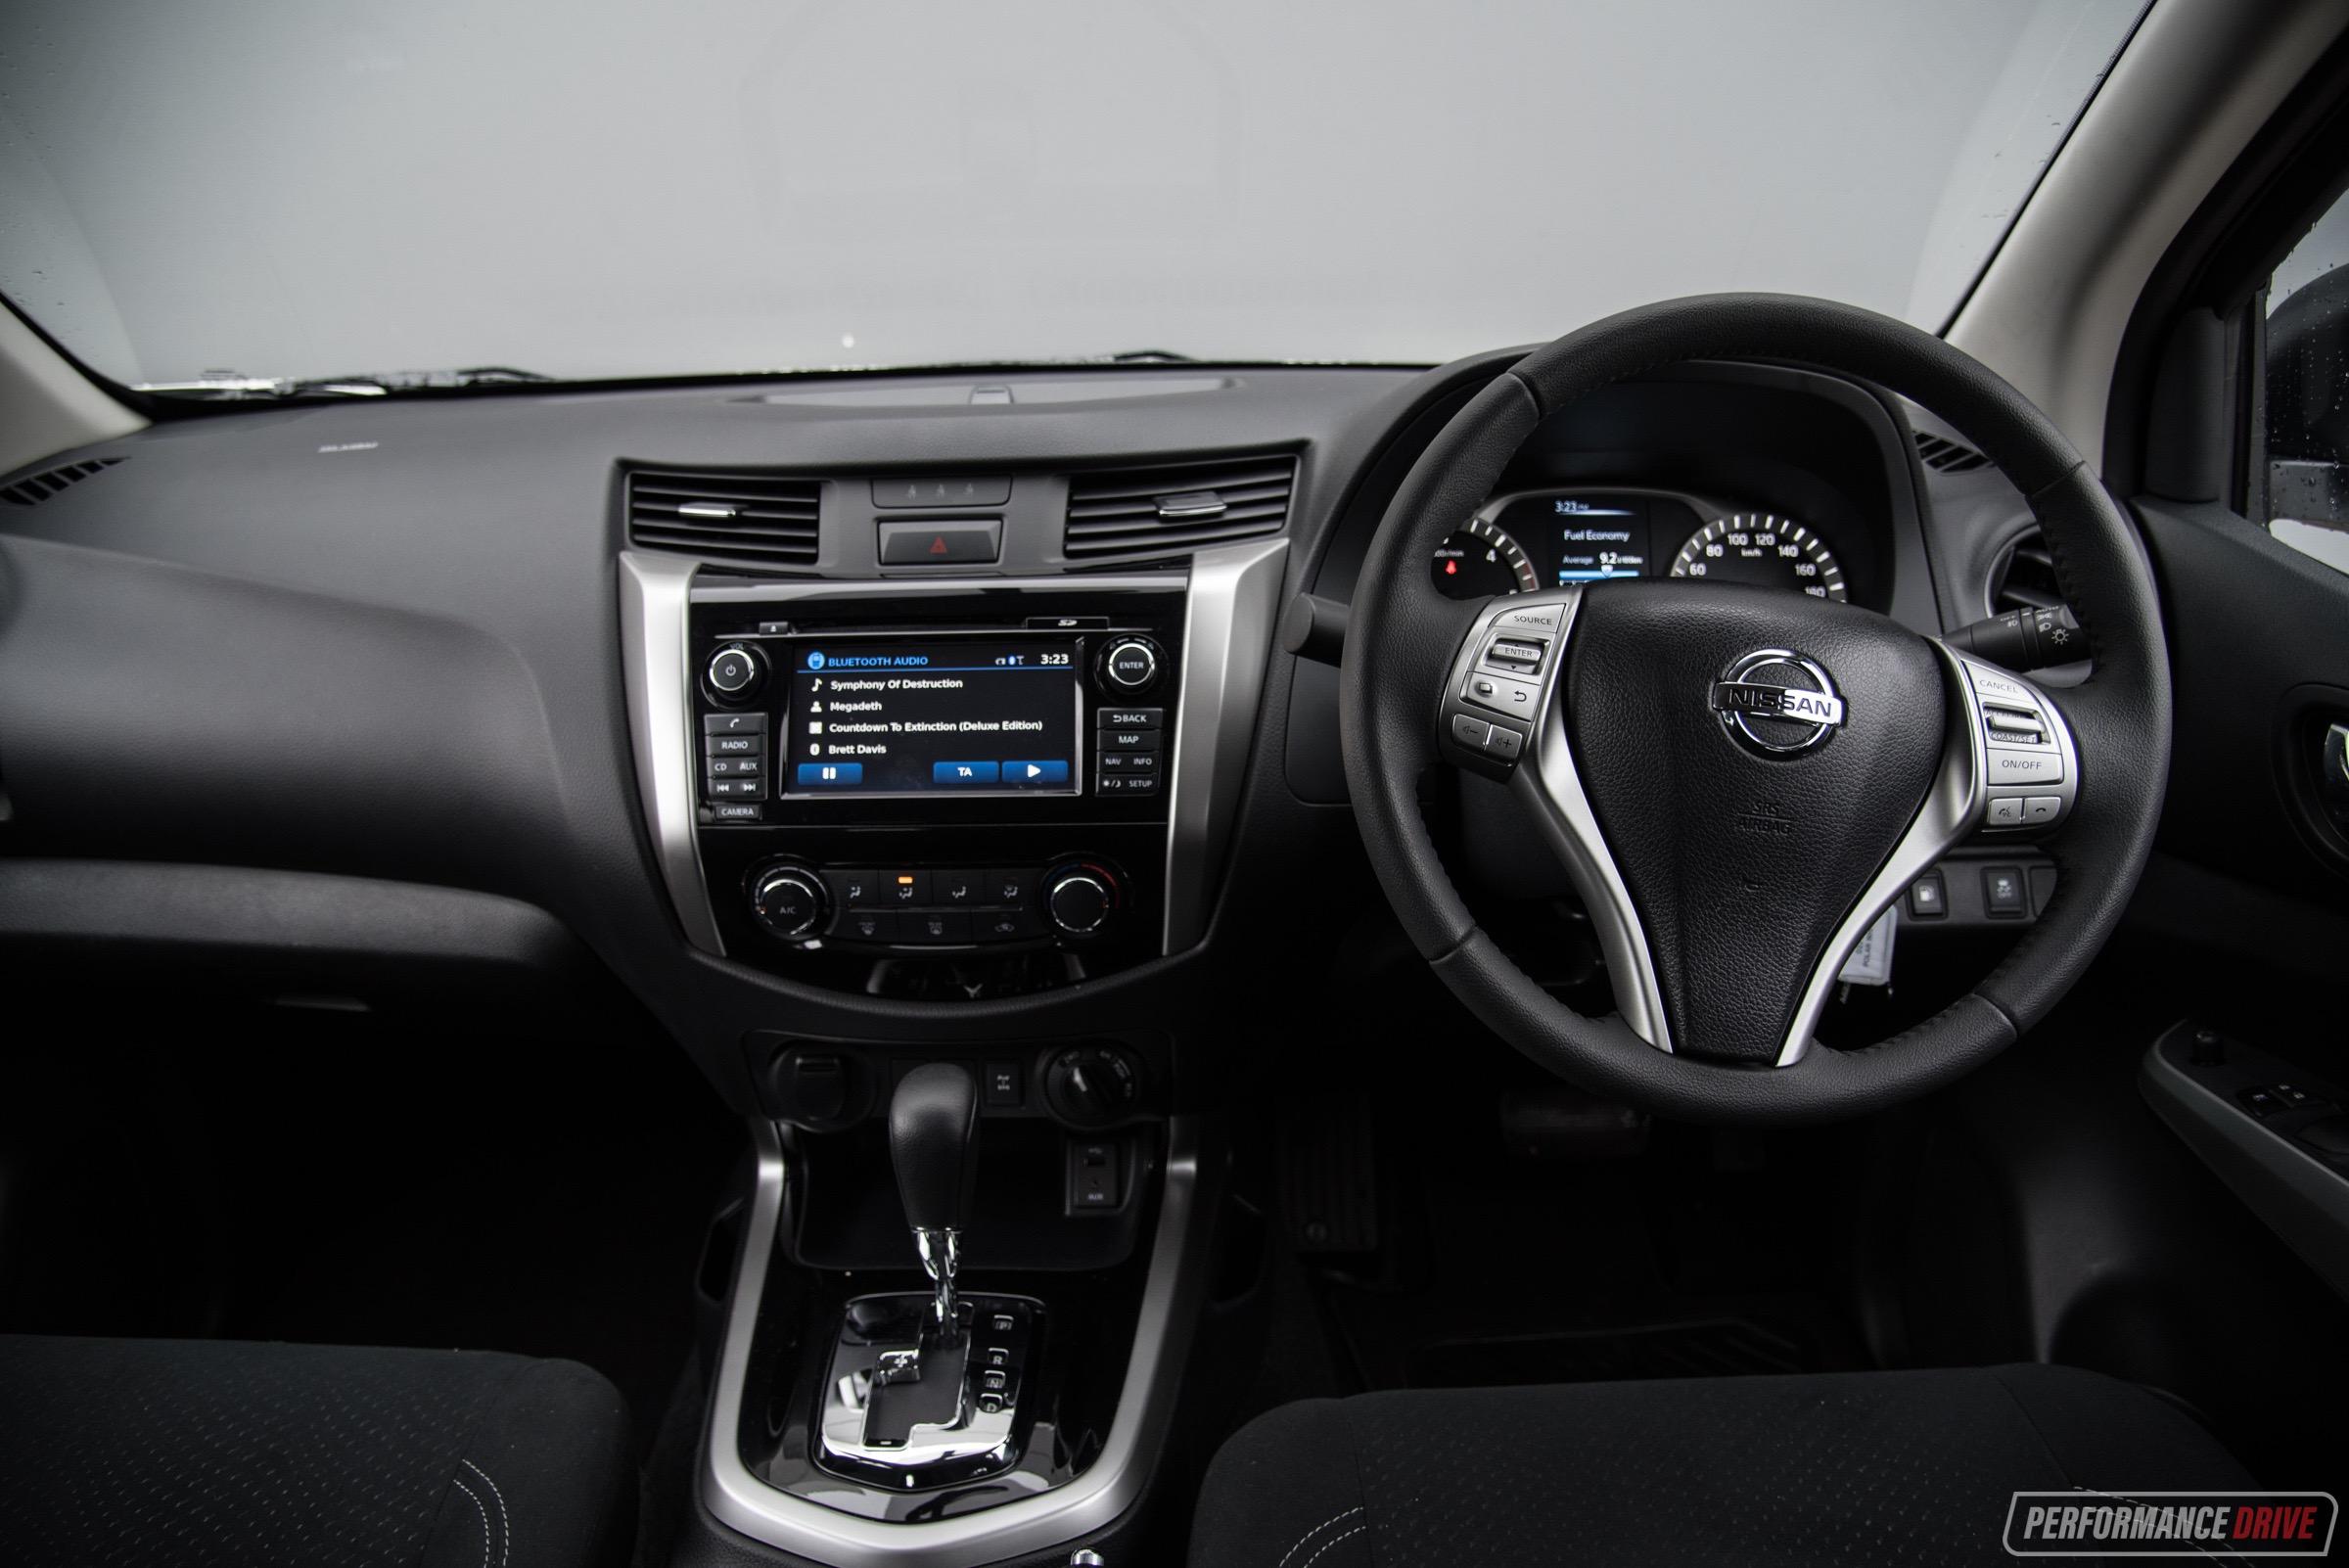 2017 Nissan Navara St Review Video Performancedrive